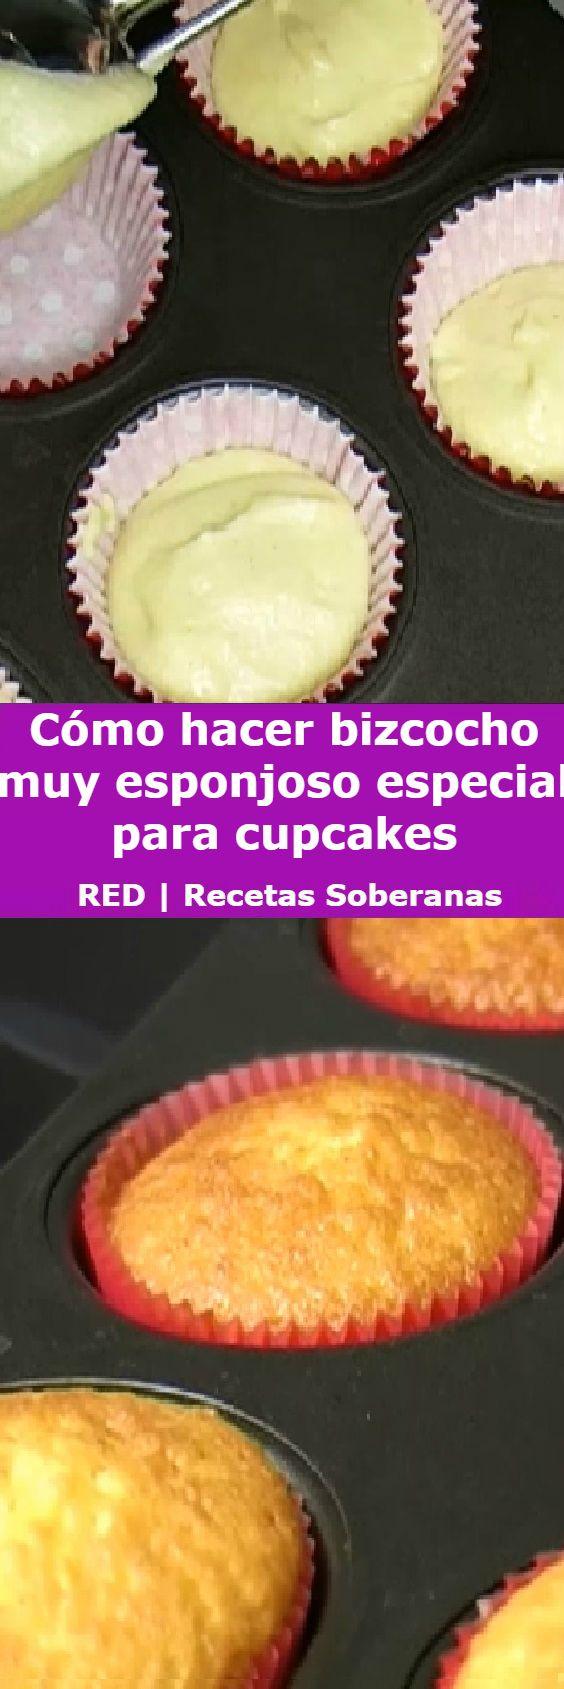 Cómo hacer bizcocho muy esponjoso especial para cupcakes.  #esponjoso #cupcakes #vainilla #comohacer #perfect #postres #receta #recipe #casero #torta #tartas #pastel #nestlecocina #bizcocho #bizcochuelo #tasty #cocina #chocolate #pan #panes Si te gusta dinos HOLA y dale a Me Gusta MIREN